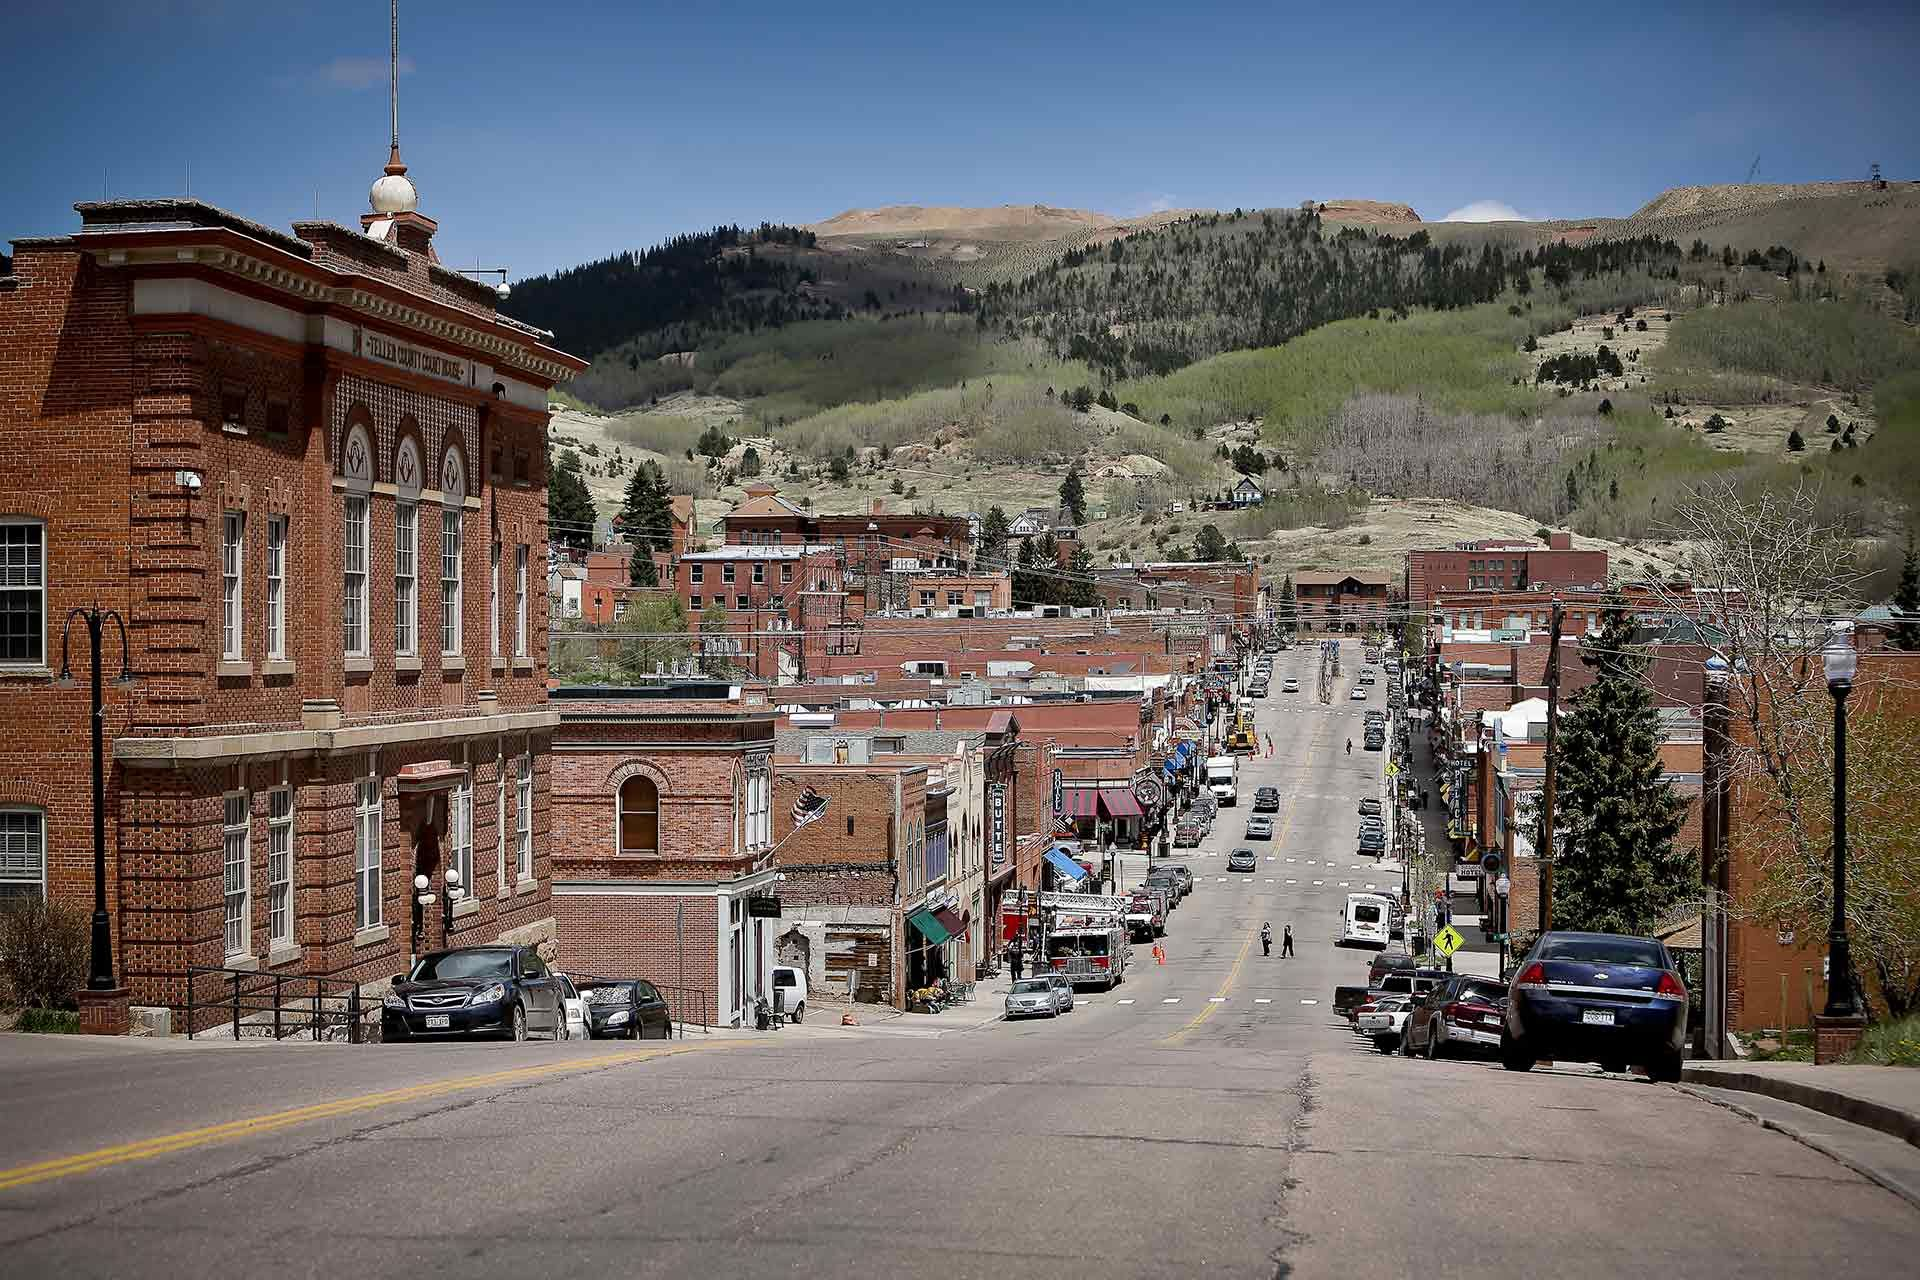 Historic Town Of Cripple Creek Colorado